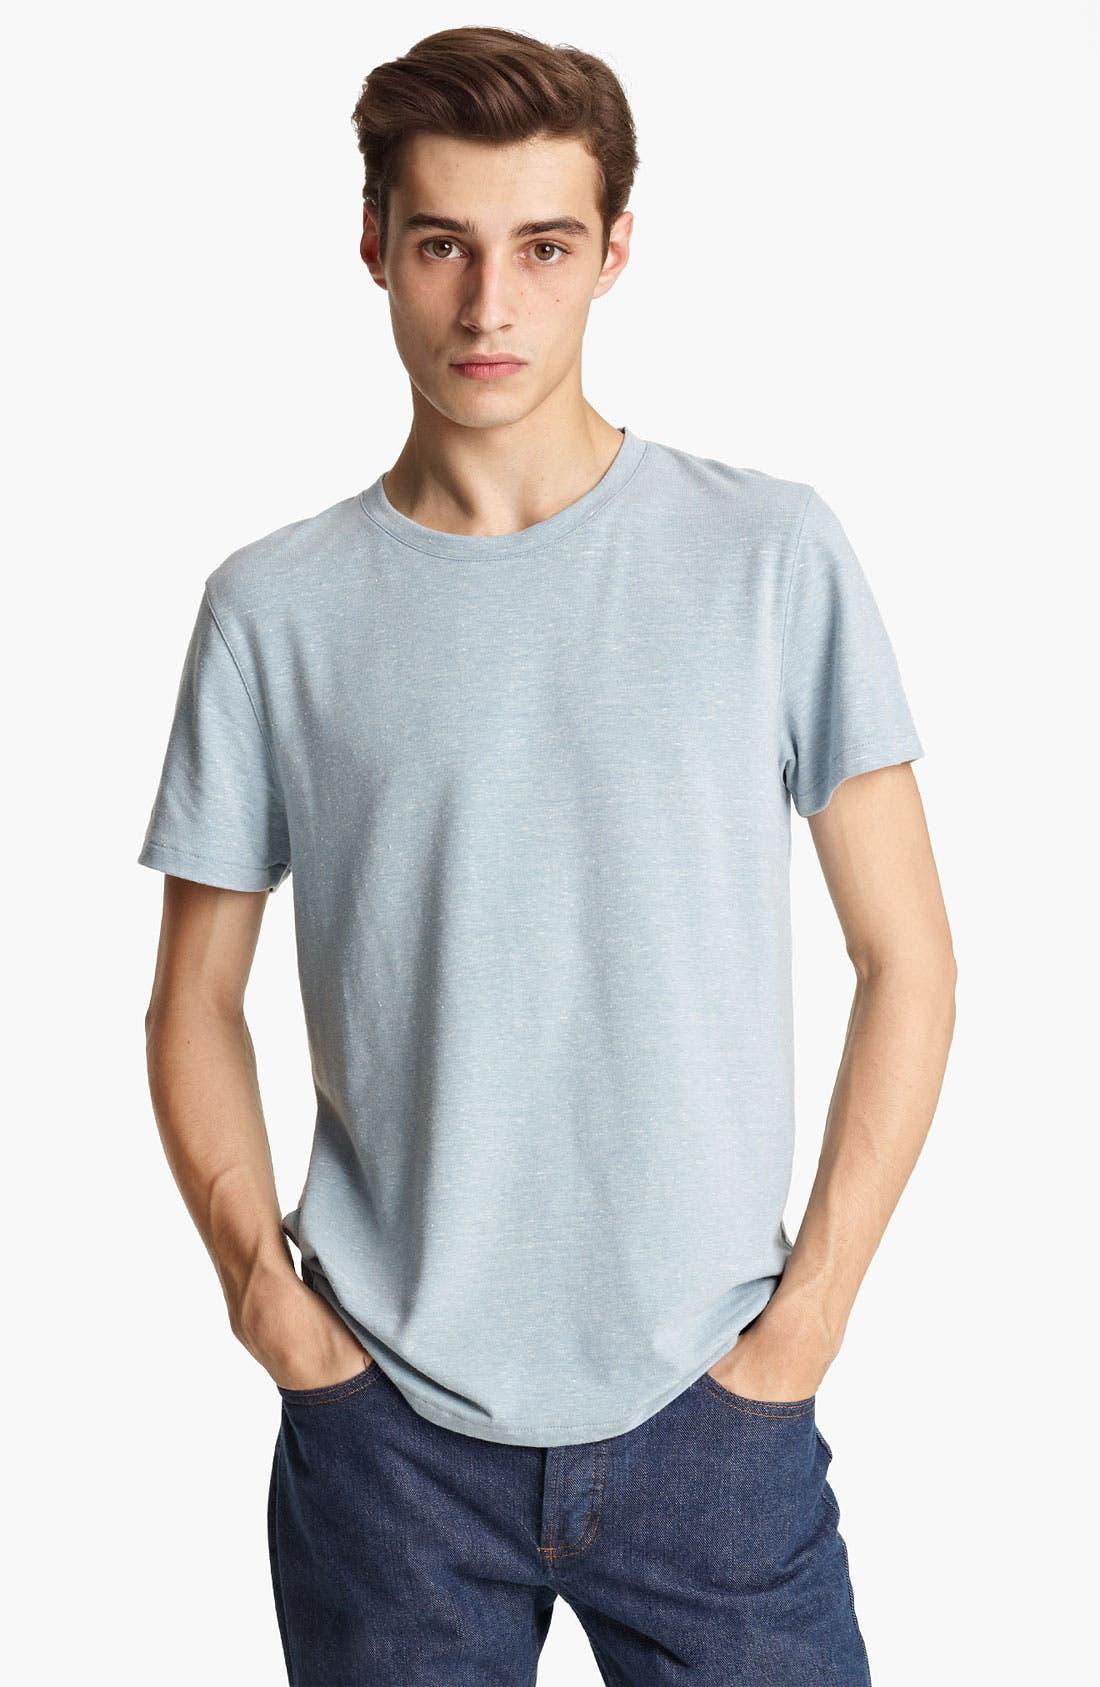 Main Image - A.P.C. Heathered T-Shirt